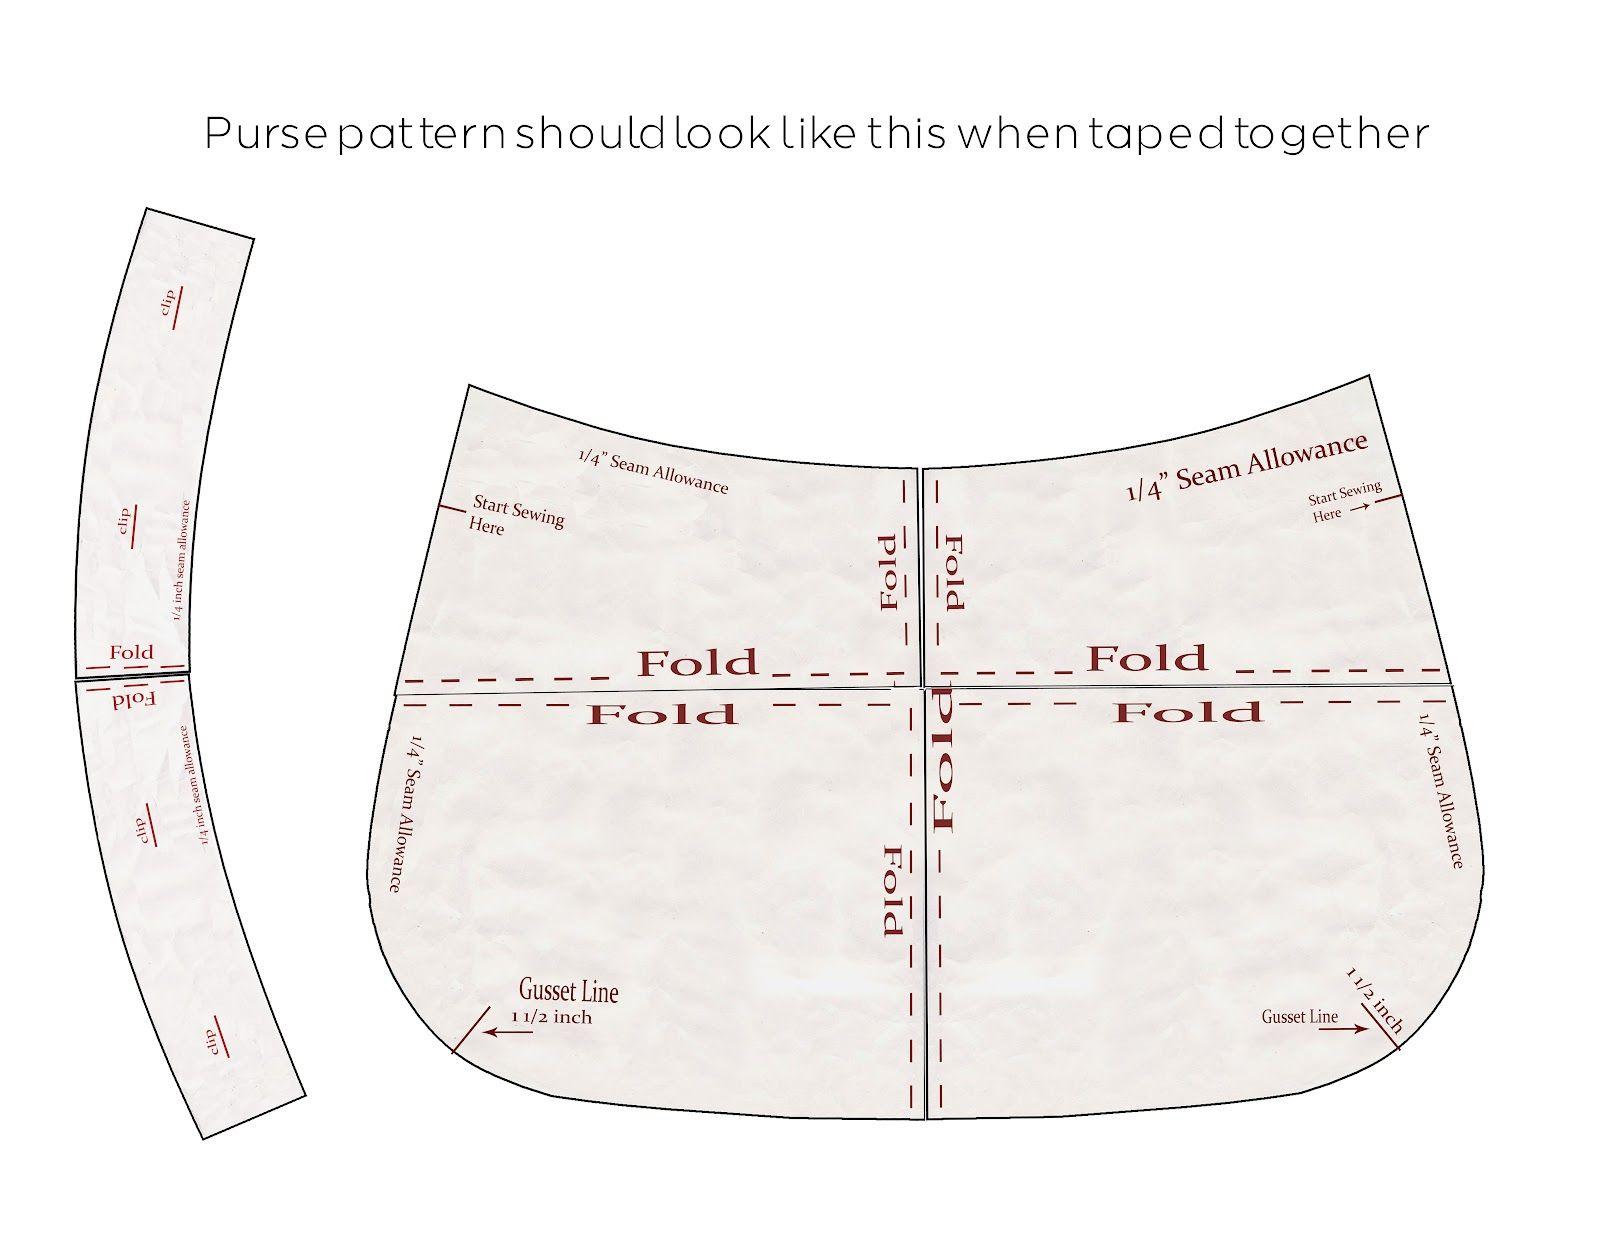 Purse Patterns Print Free |  Download The Pattern Pieces To Your - Free Printable Purse Patterns To Sew